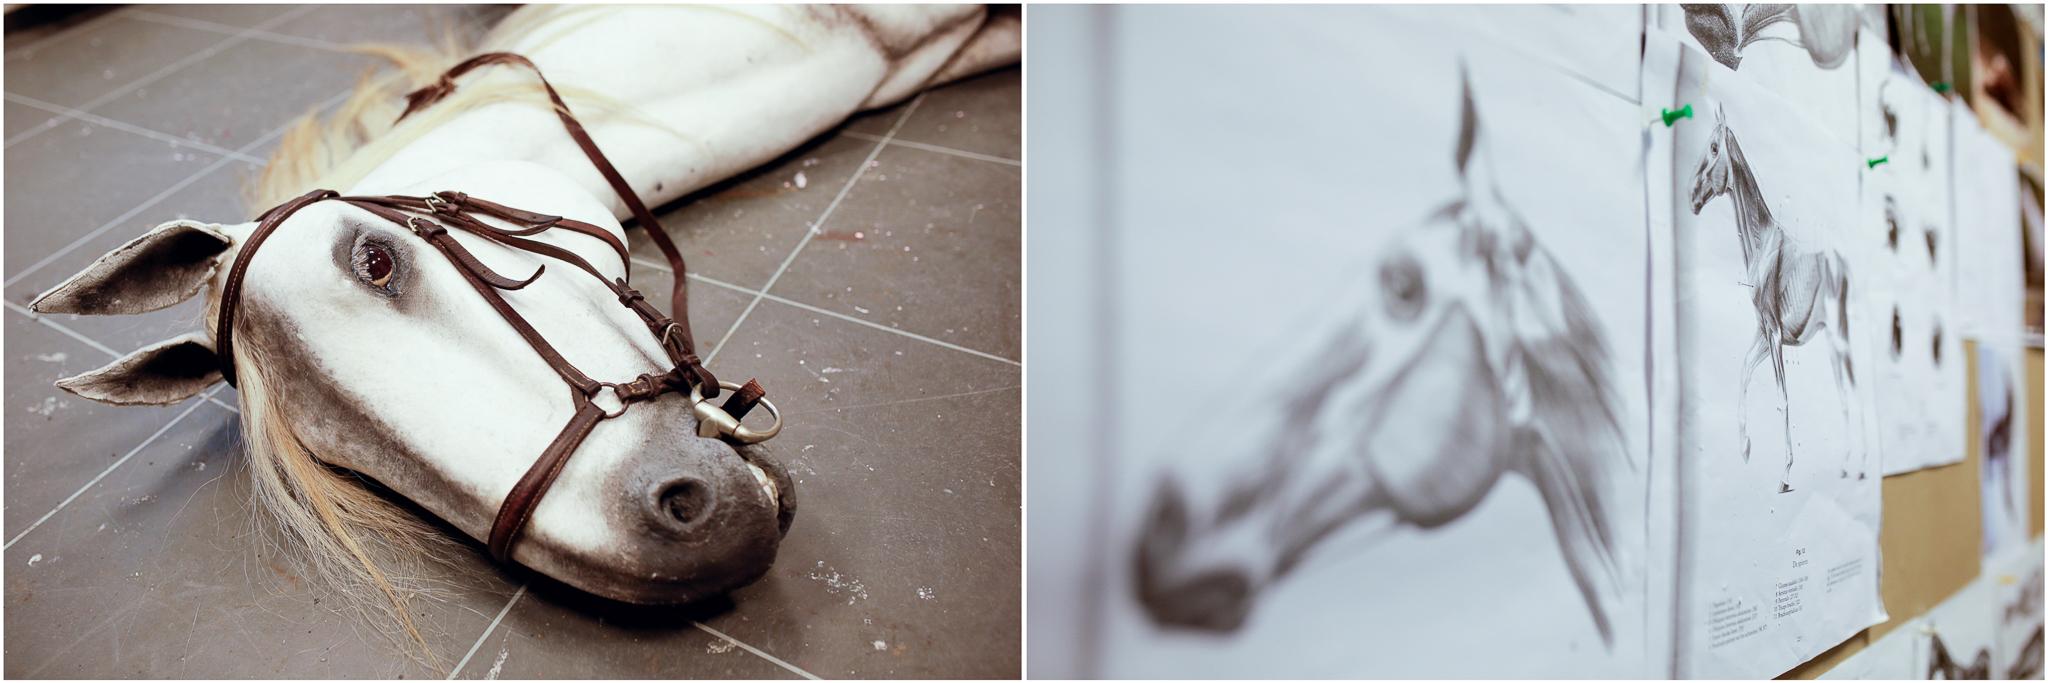 013_Fotografie Nationale Opera Ballet.jpg